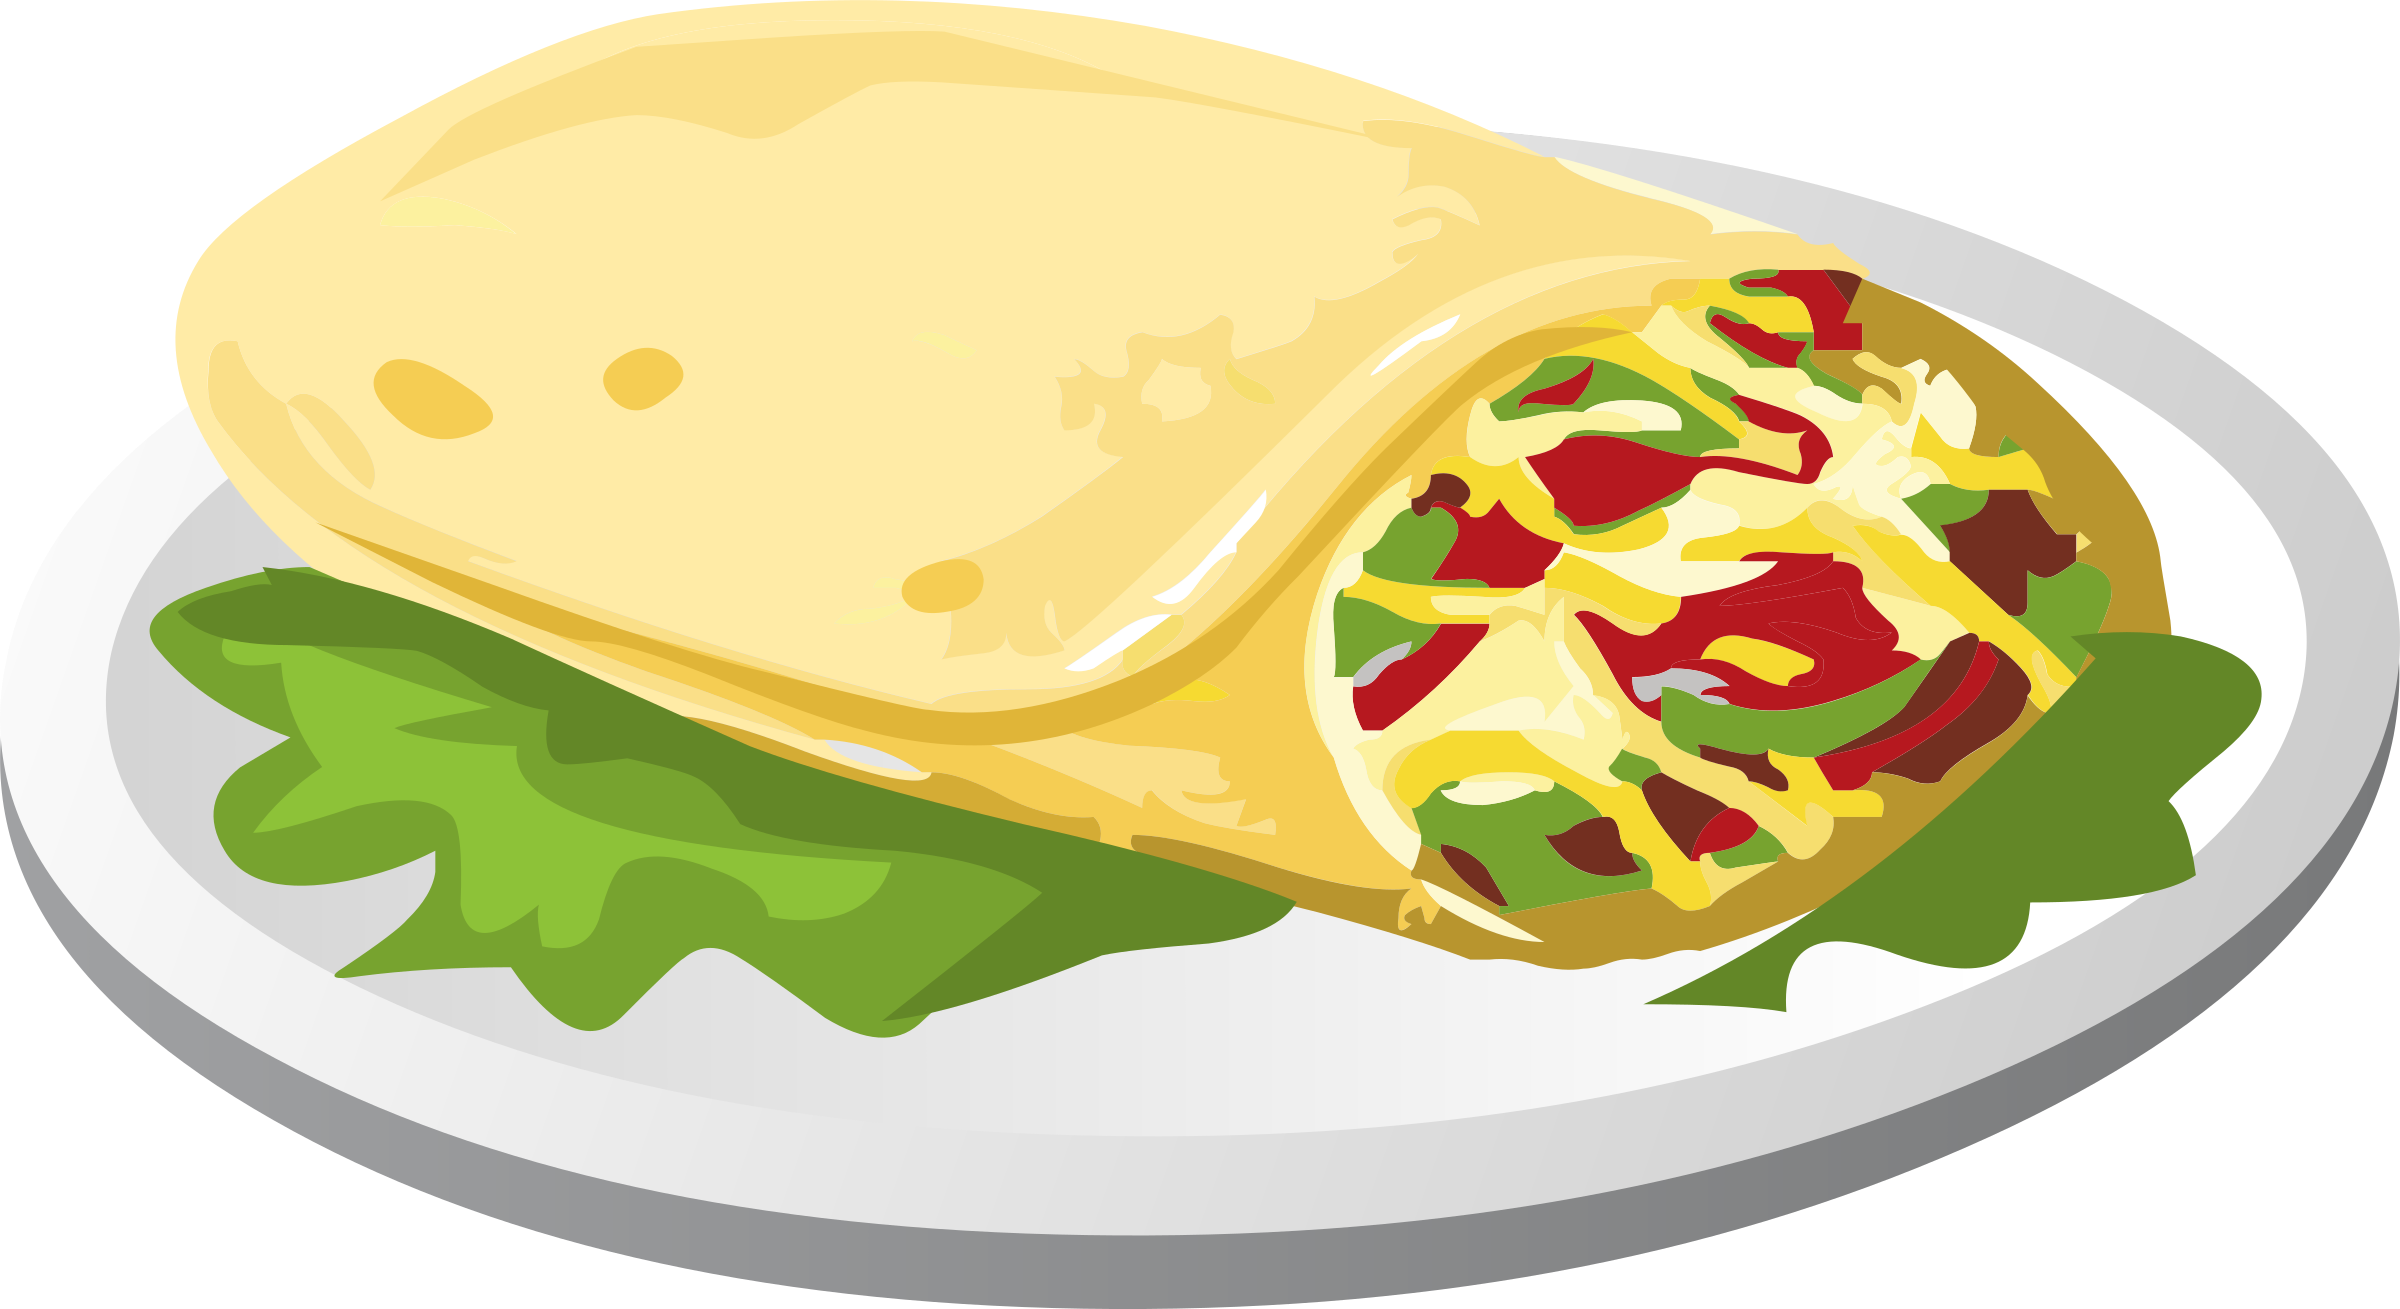 banner royalty free Food kind breakfurst icons. Burrito transparent clip art